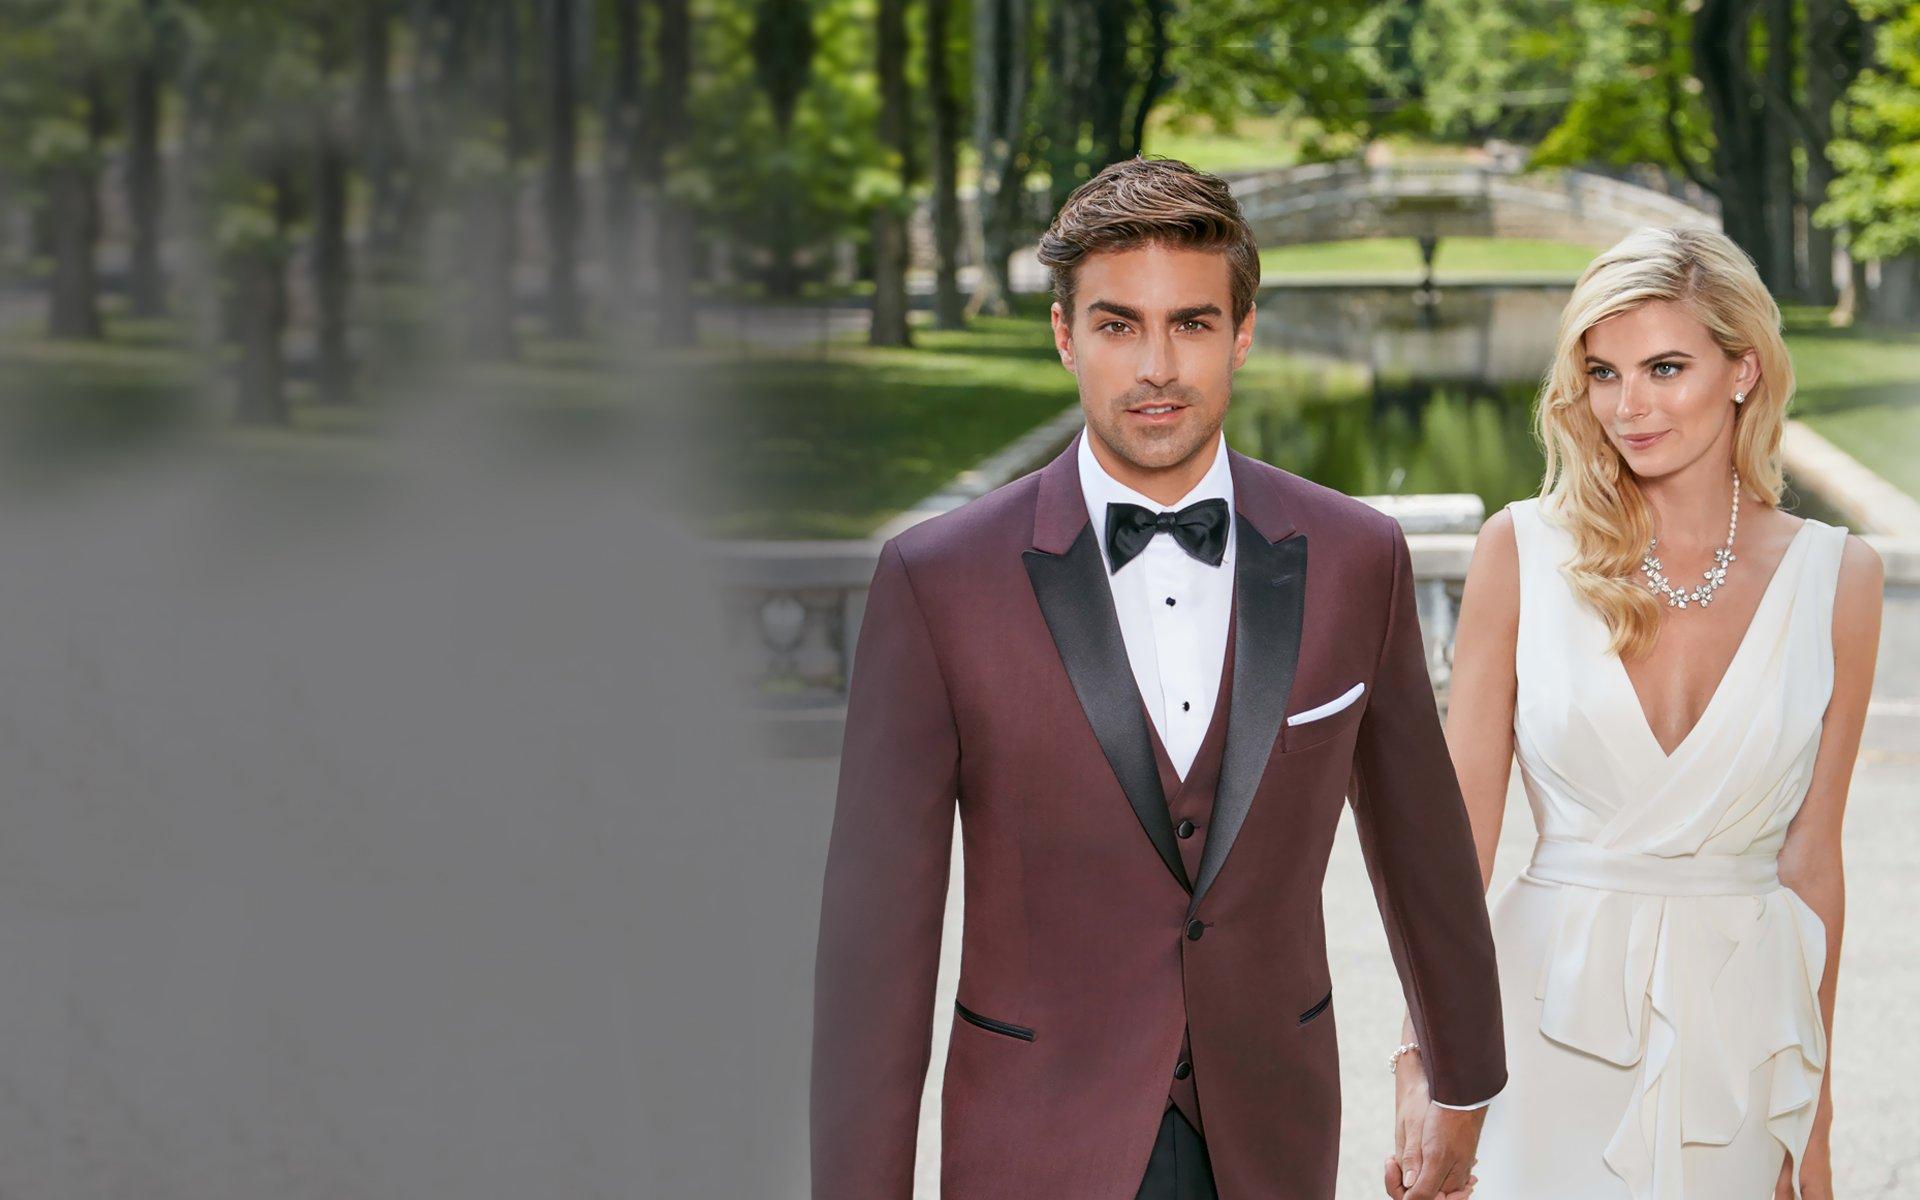 Tuxedo Rentals, Futia's Tuxedo Bridal & Prom Gowns